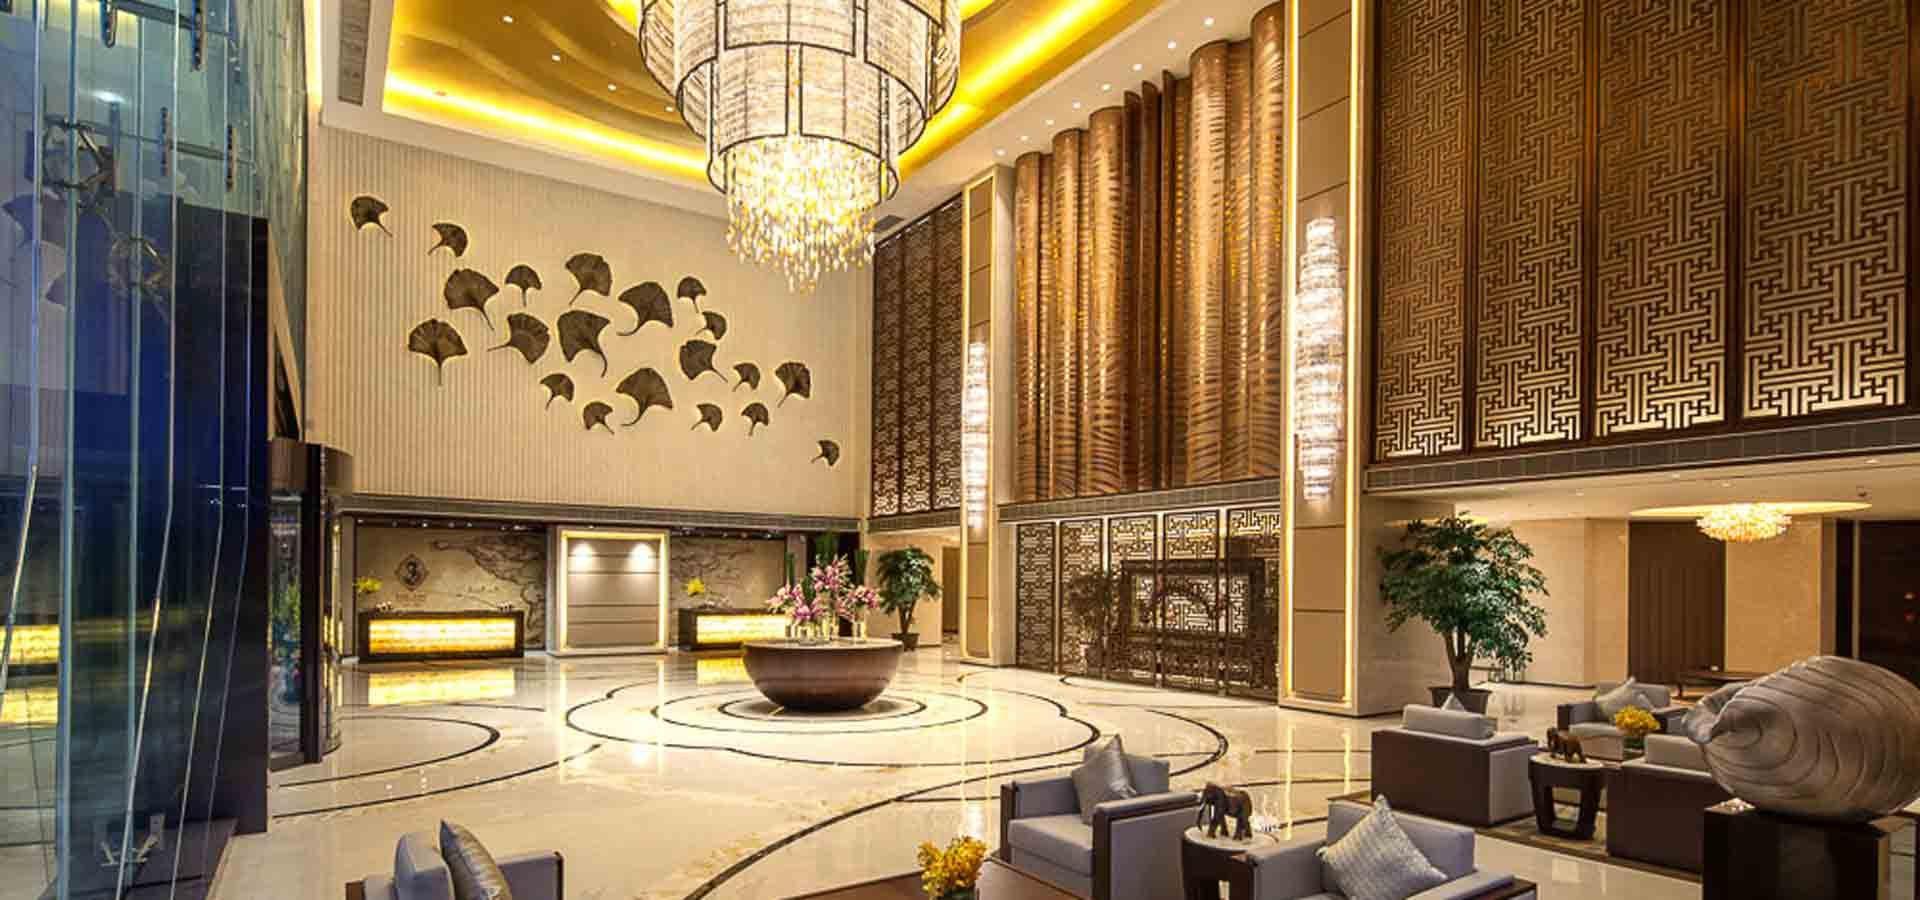 dusit-thani-dongtai-Home-Hotel-Lobby